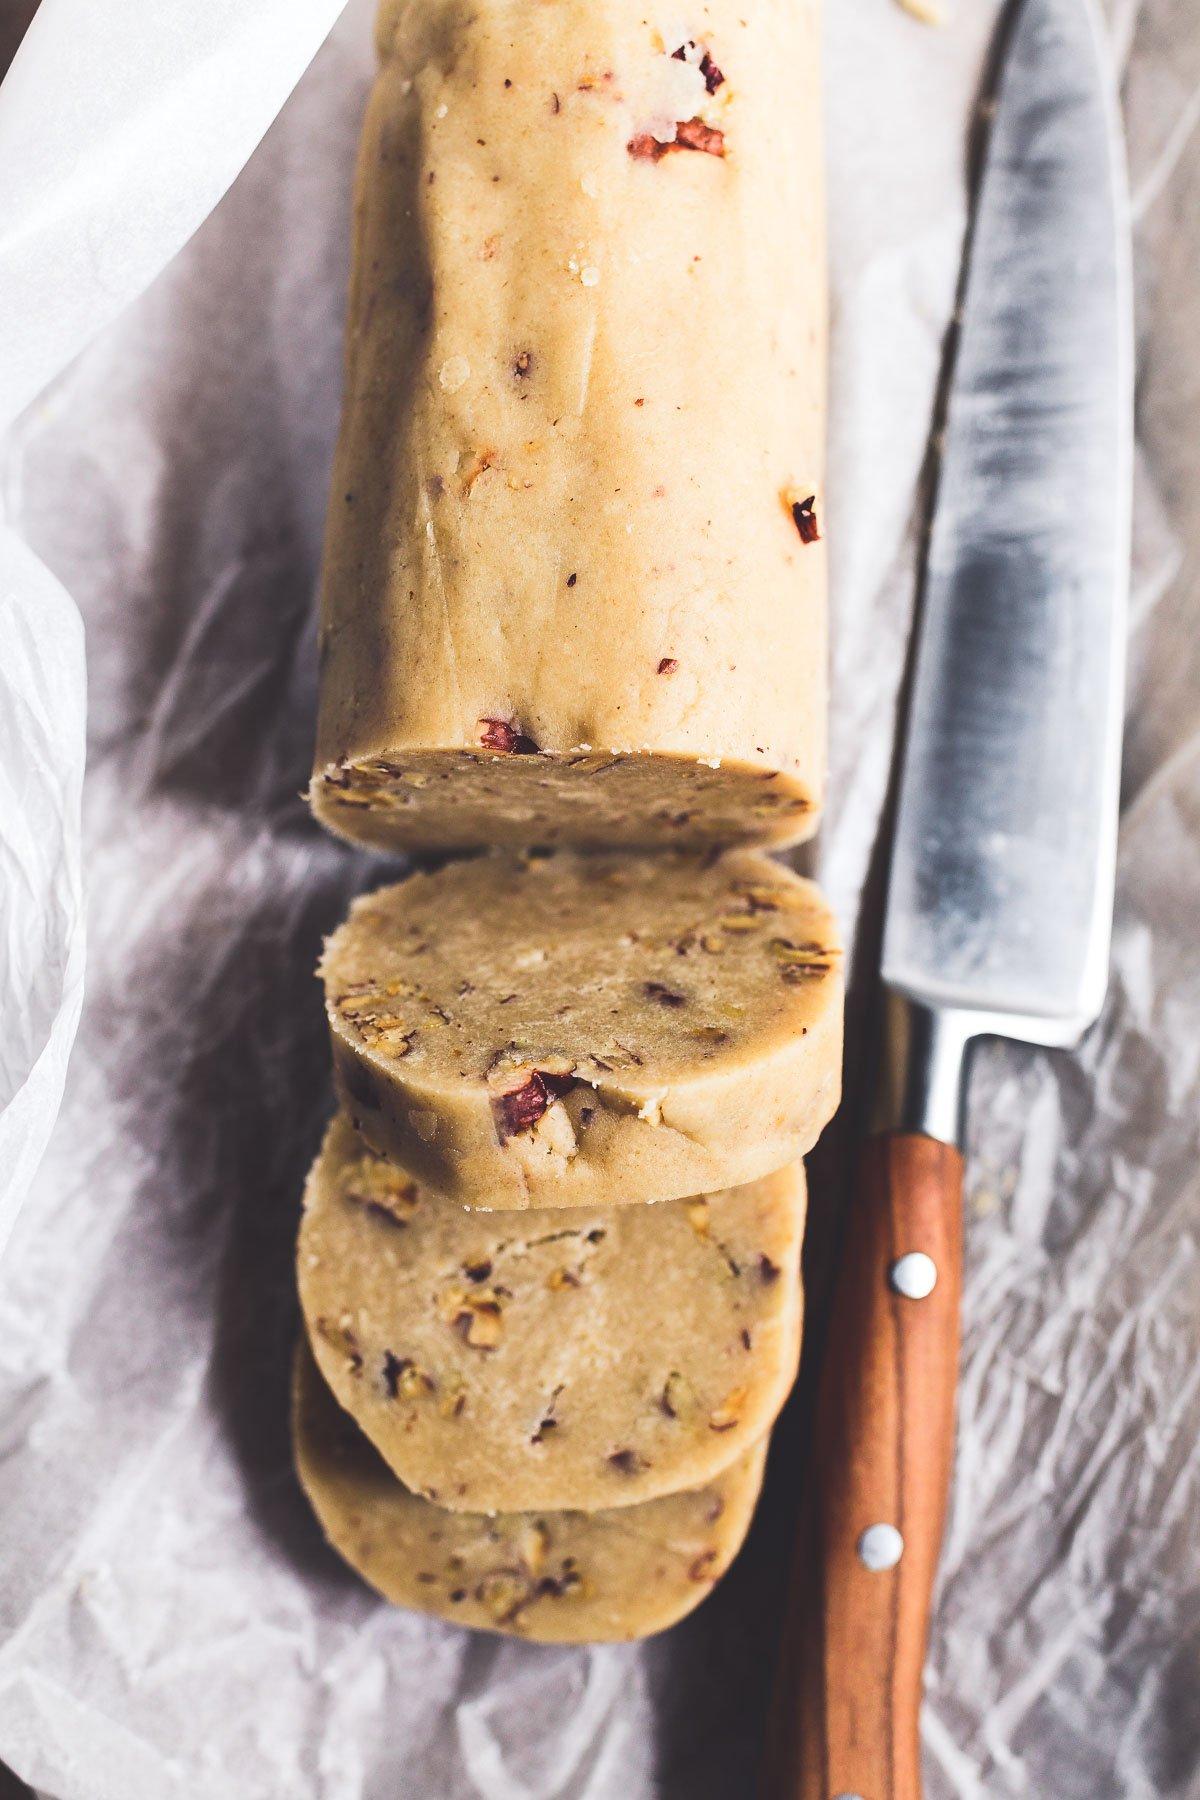 slicing a log of pecan sandies cookie dough